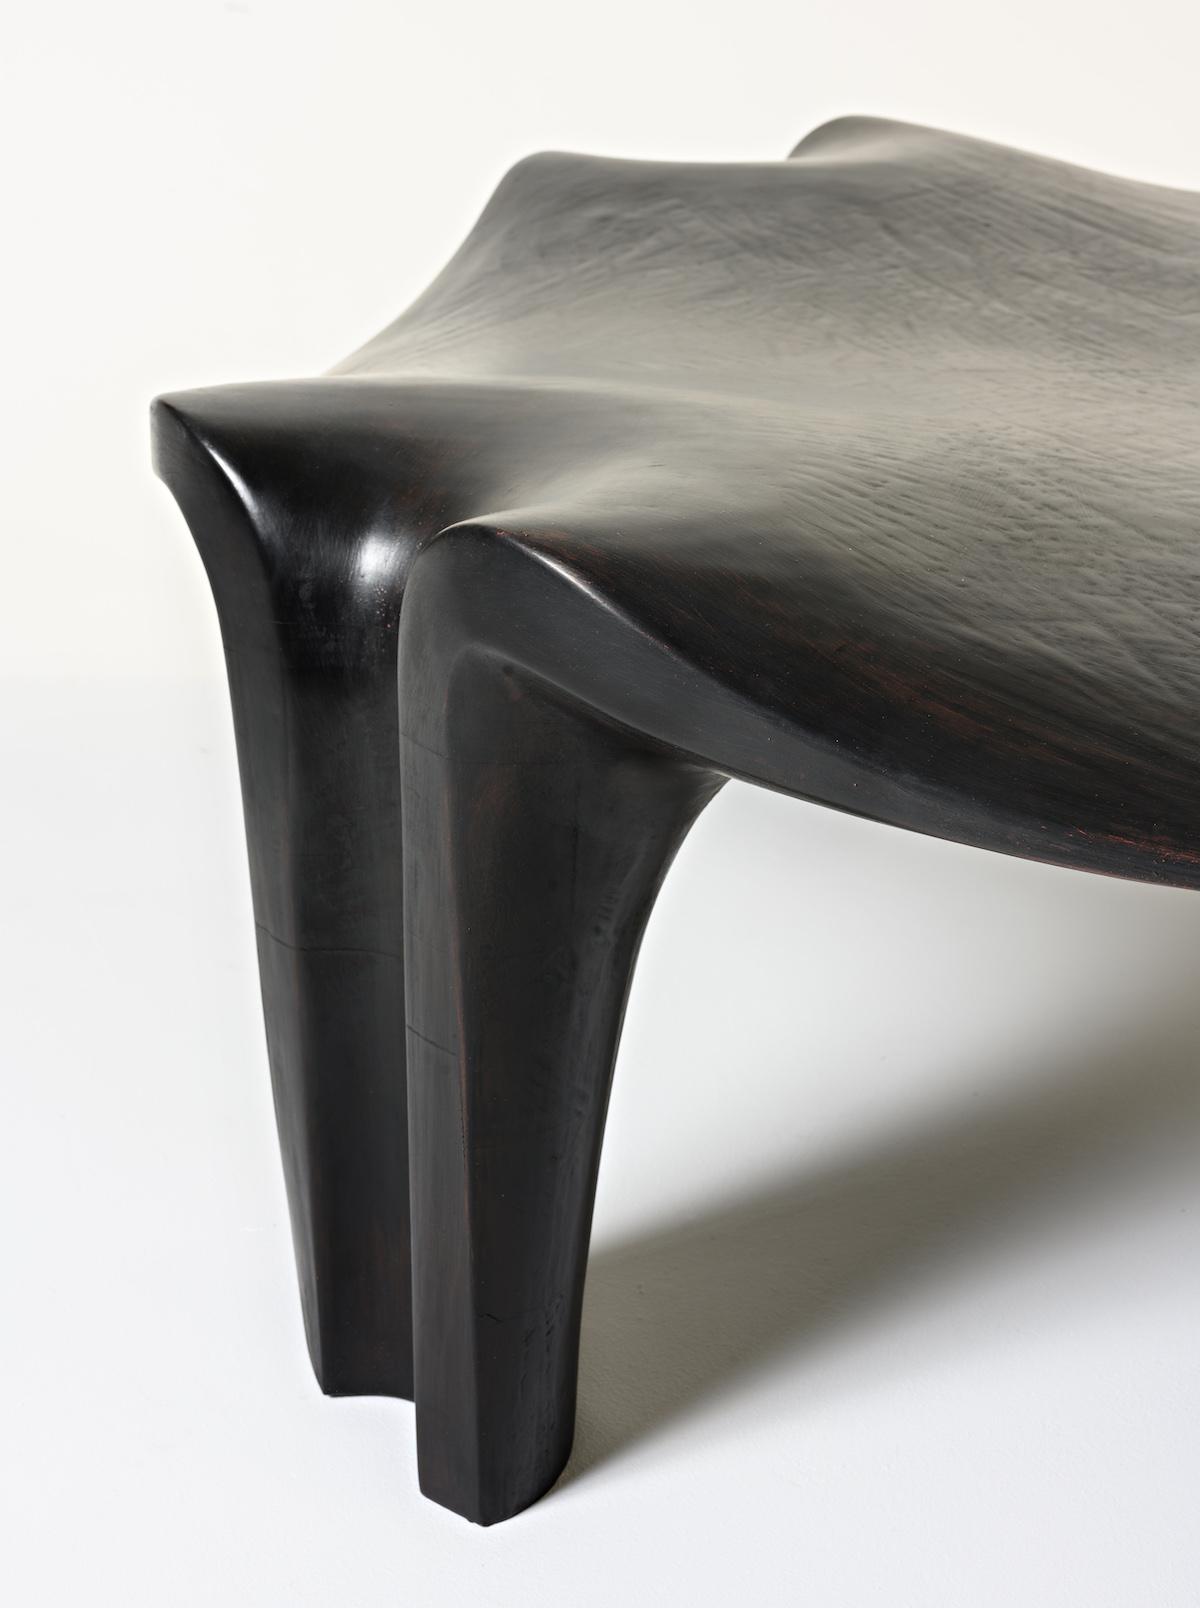 leg detail of the Thebes Bench by artist Christopher Kurtz